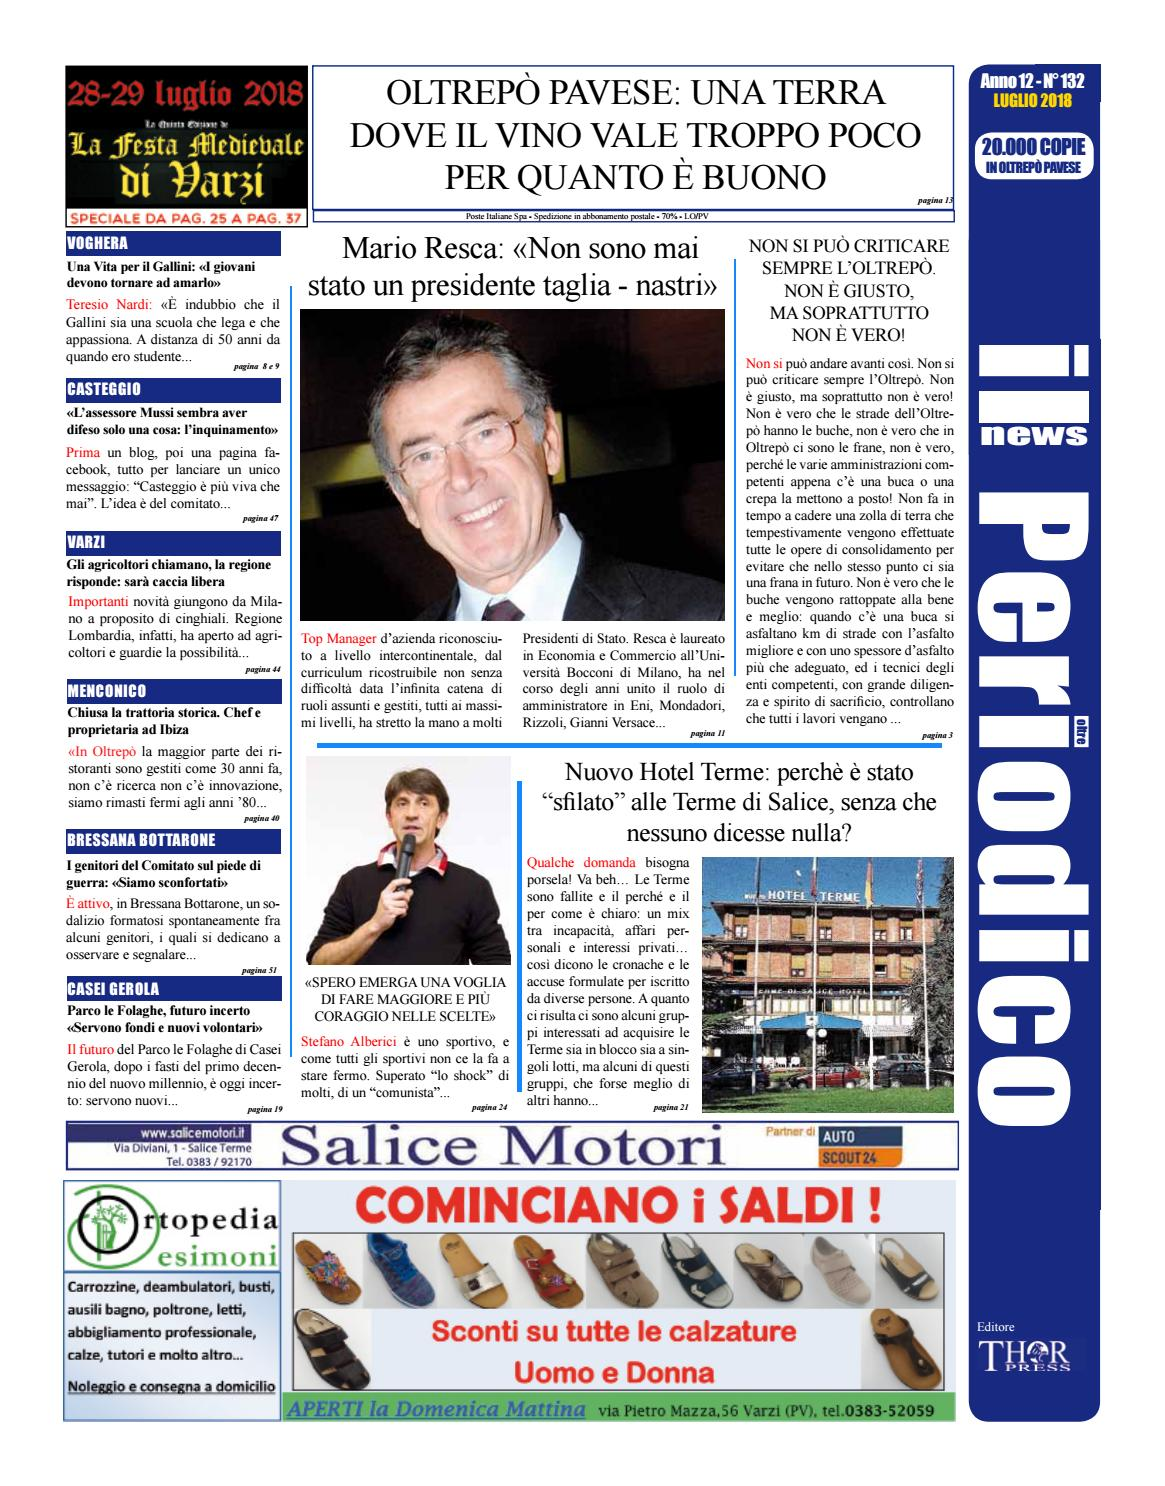 Il Periodico News - LUGLIO 2018 N°132 by IlPeriodicoNews - issuu 374580204893